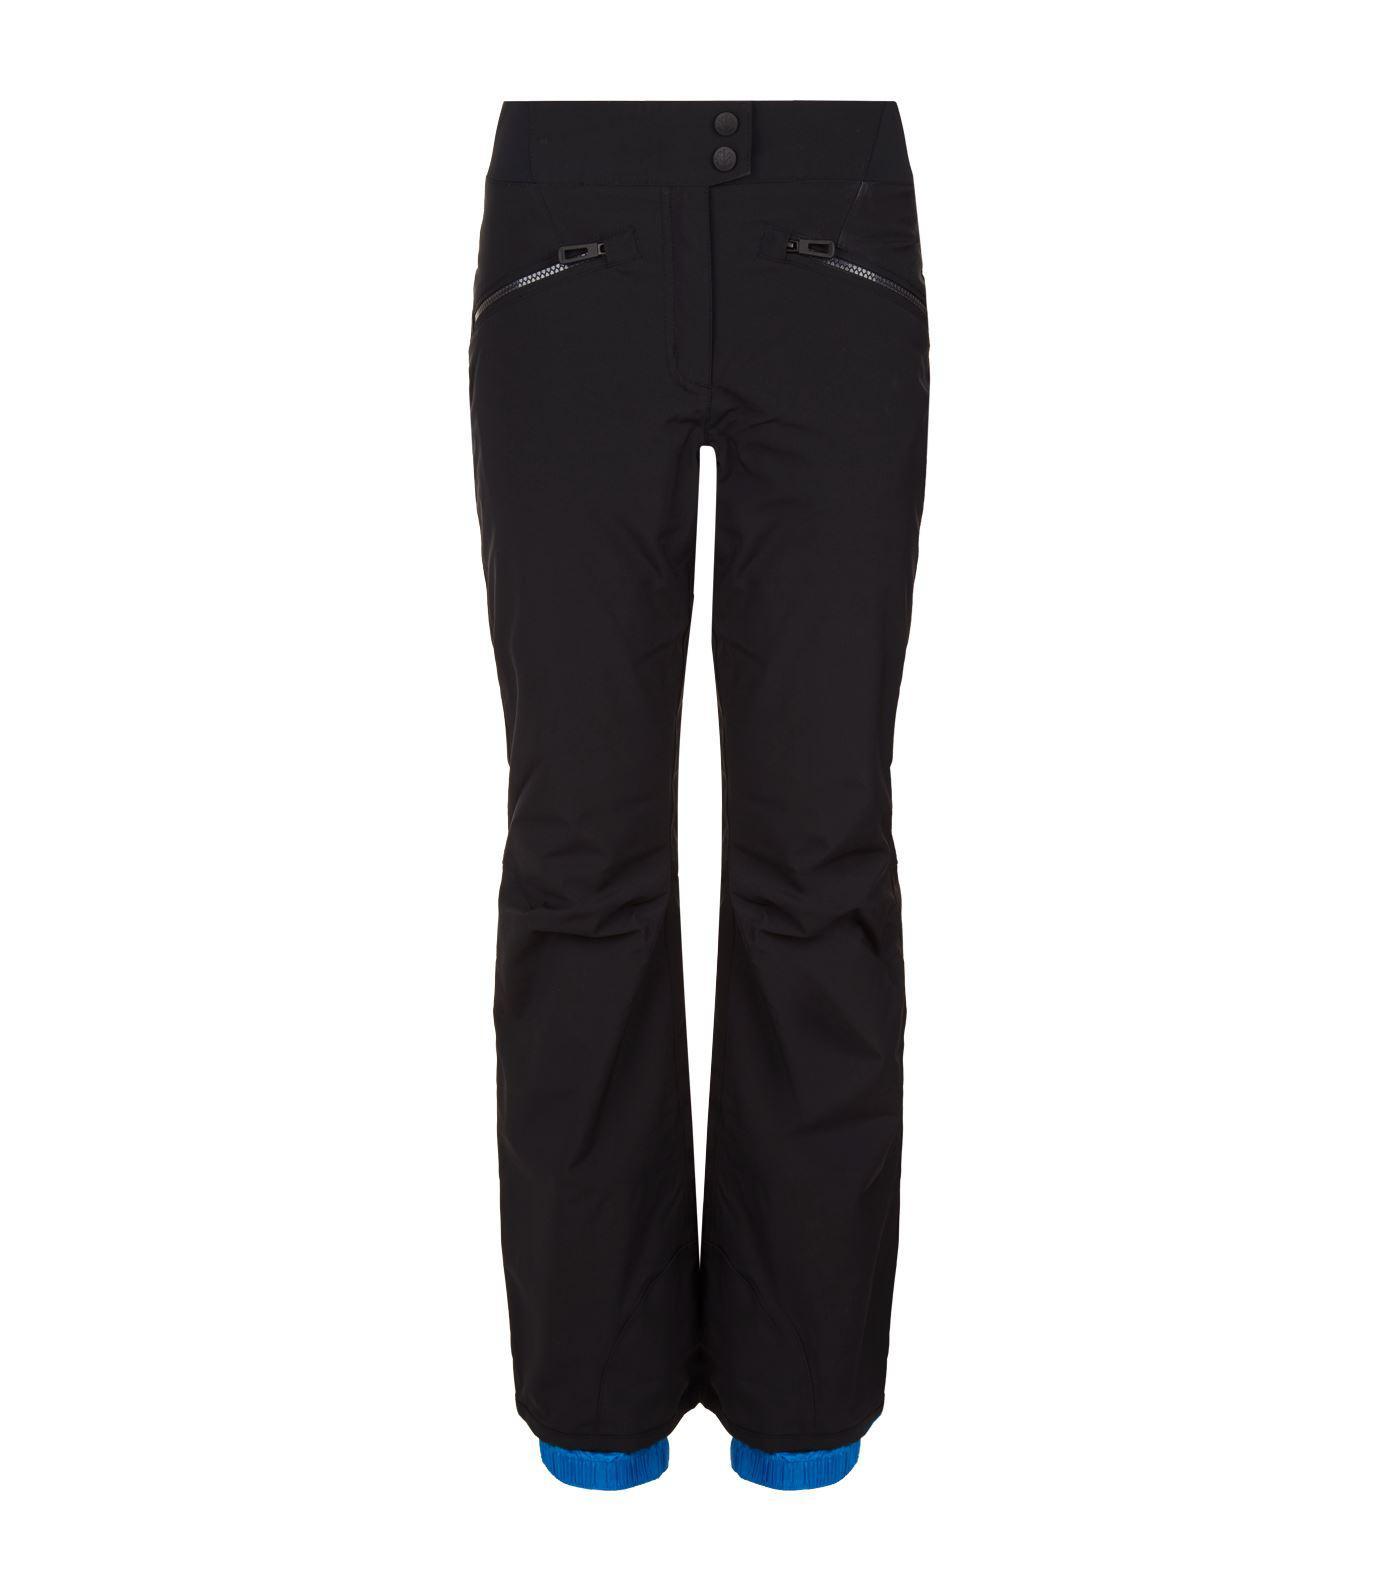 Lyst - Rossignol Classique Ski Trousers in Black 61e9362ae